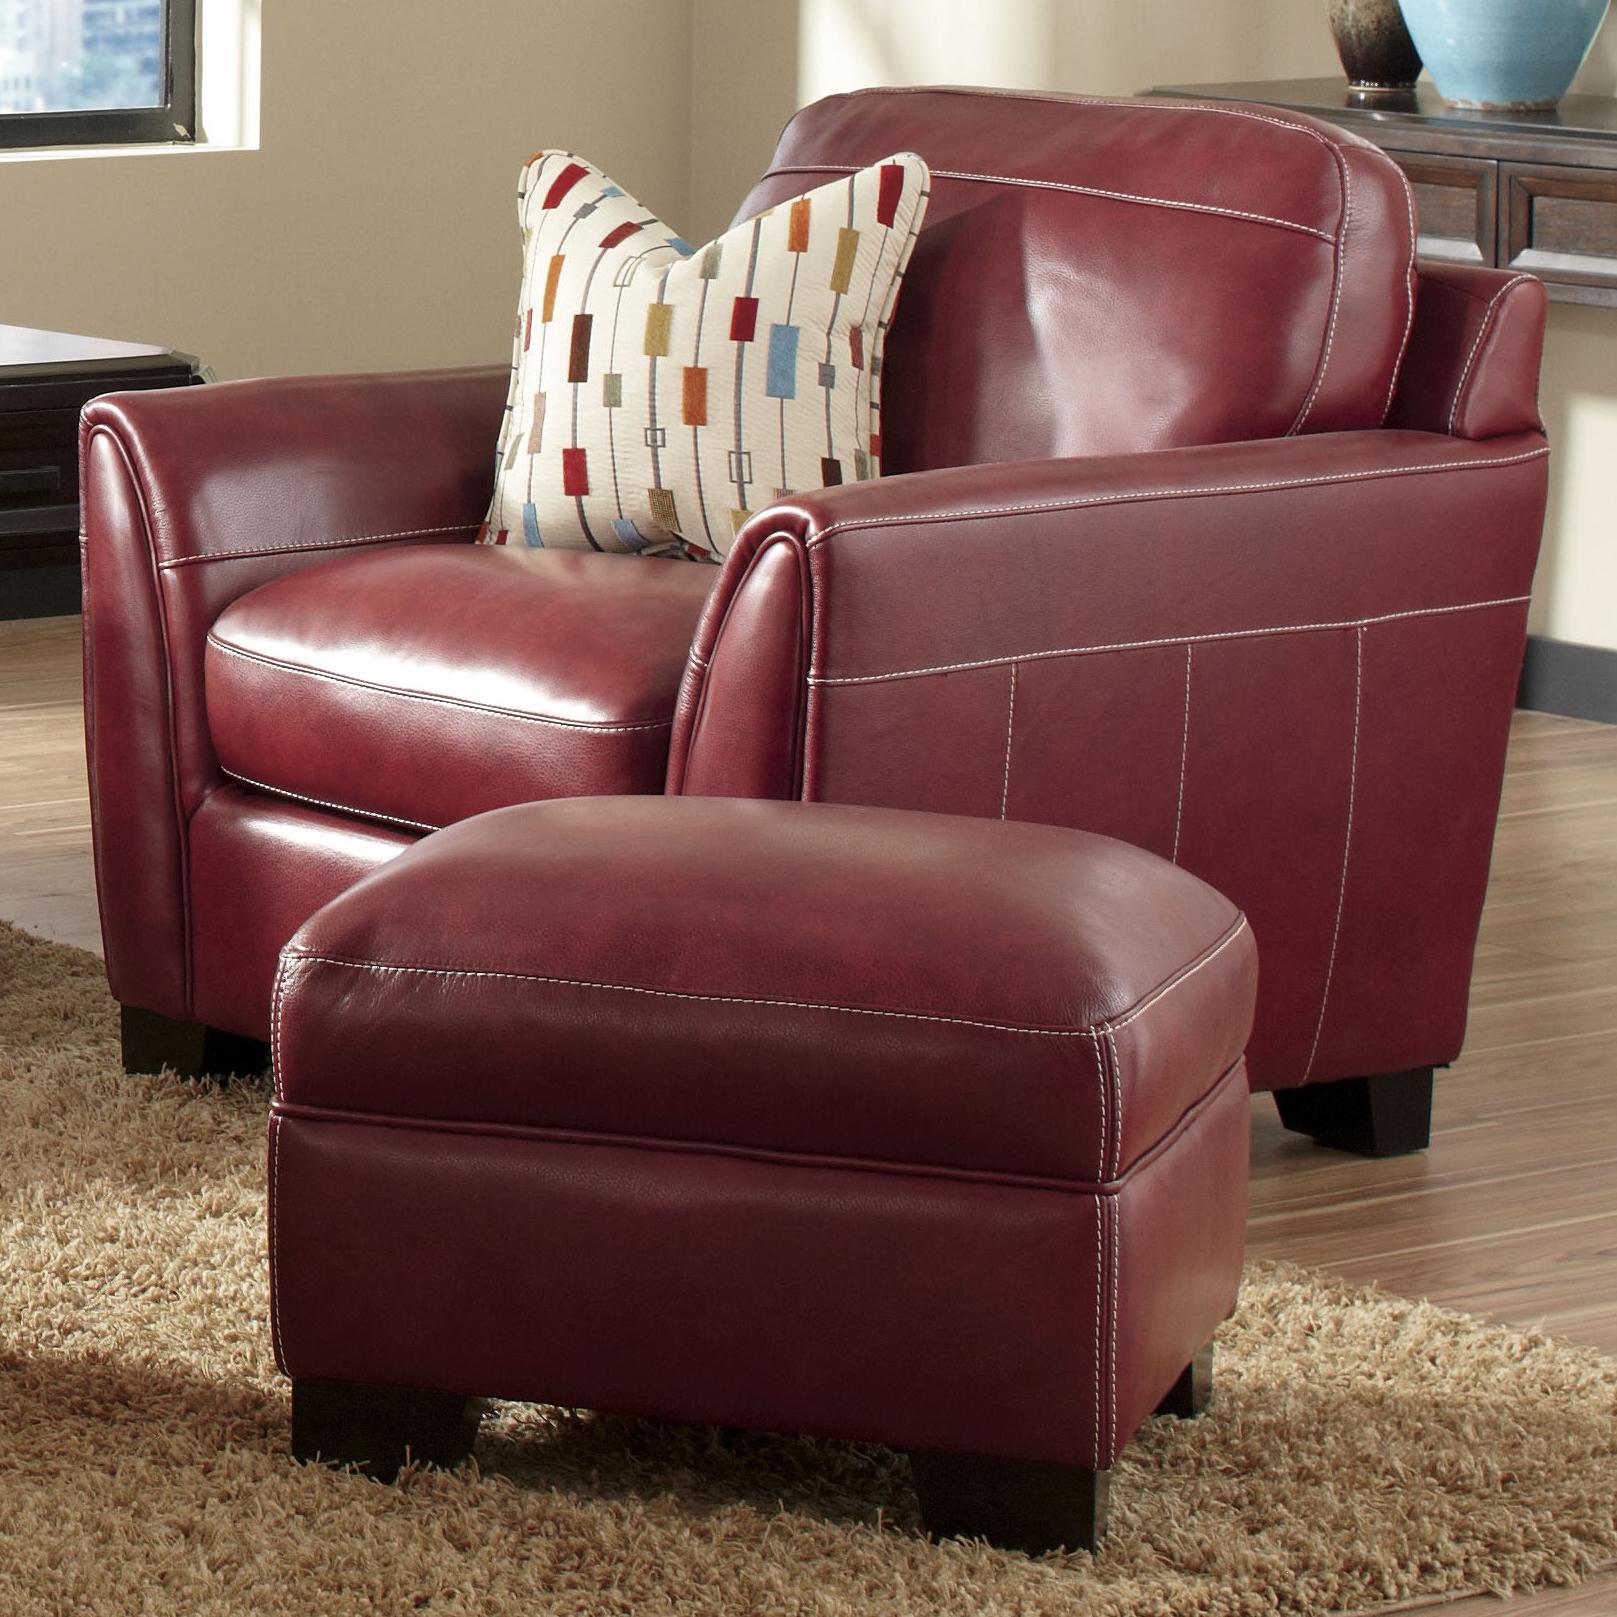 Simon Li J049 Contemporary Leather Arm Chair Ottoman